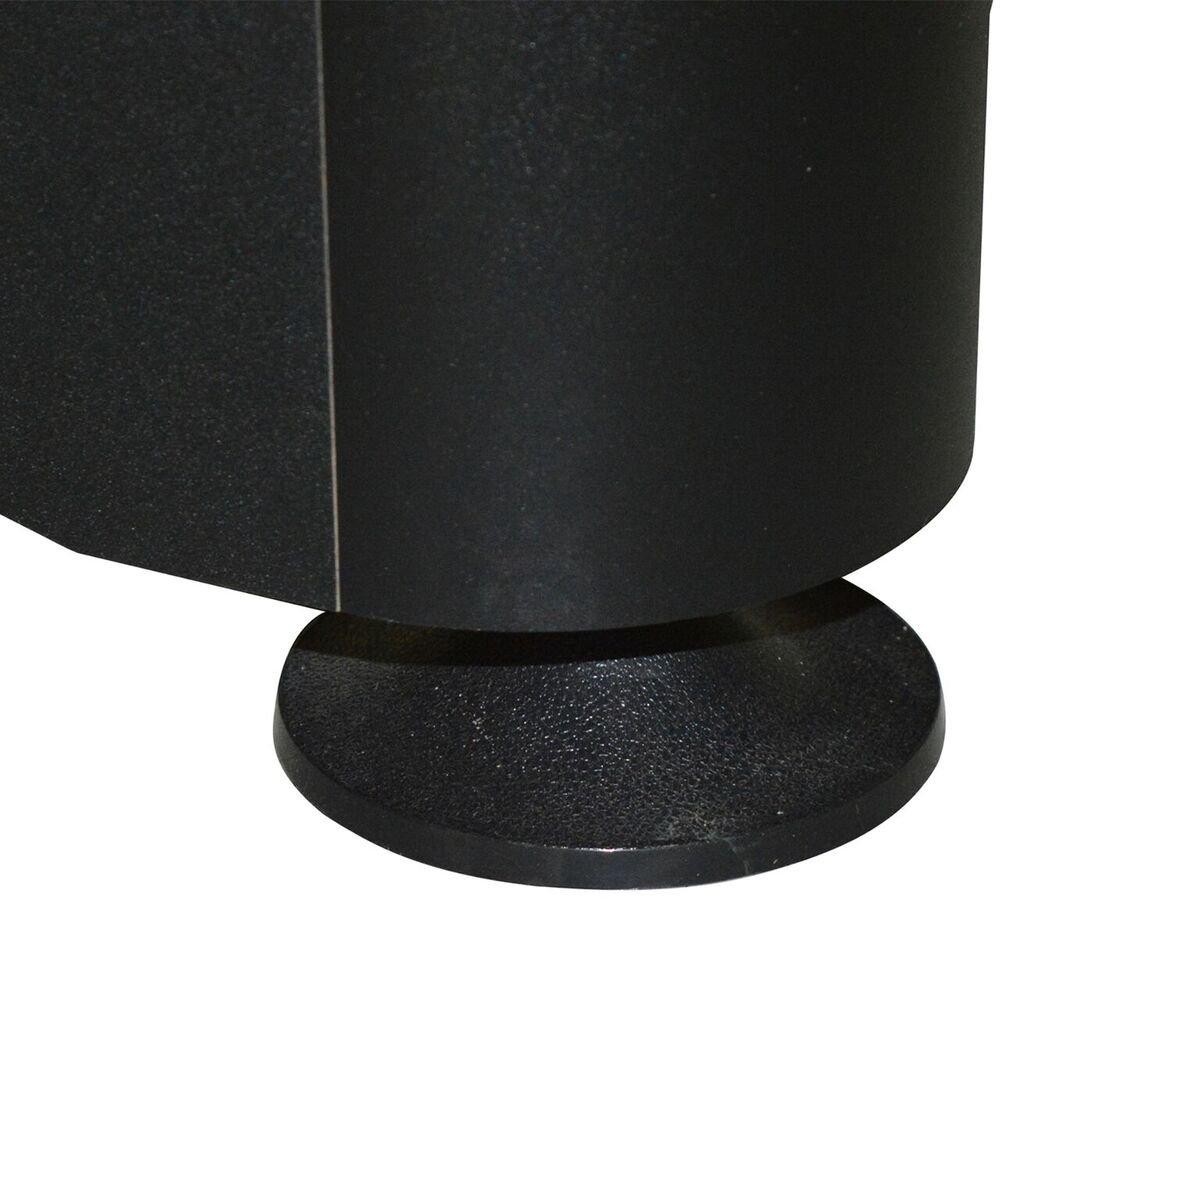 Premium Black 7-ft Air Hockey Chrome Table w/5 Year Warranty from FamilyPoolFun.com